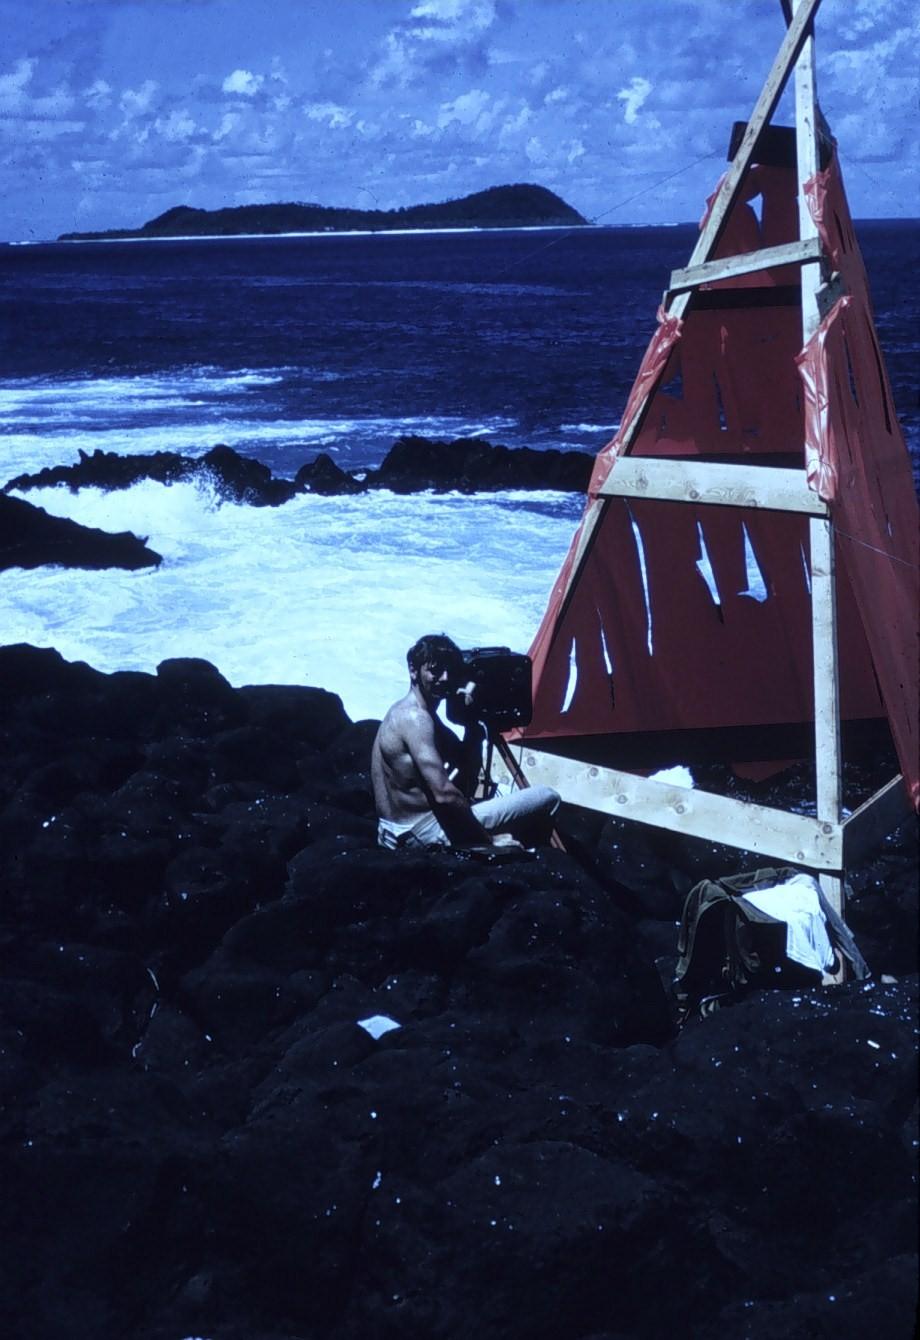 Lester B. Smith making Tellurometer observations. Off of SURVEYOR